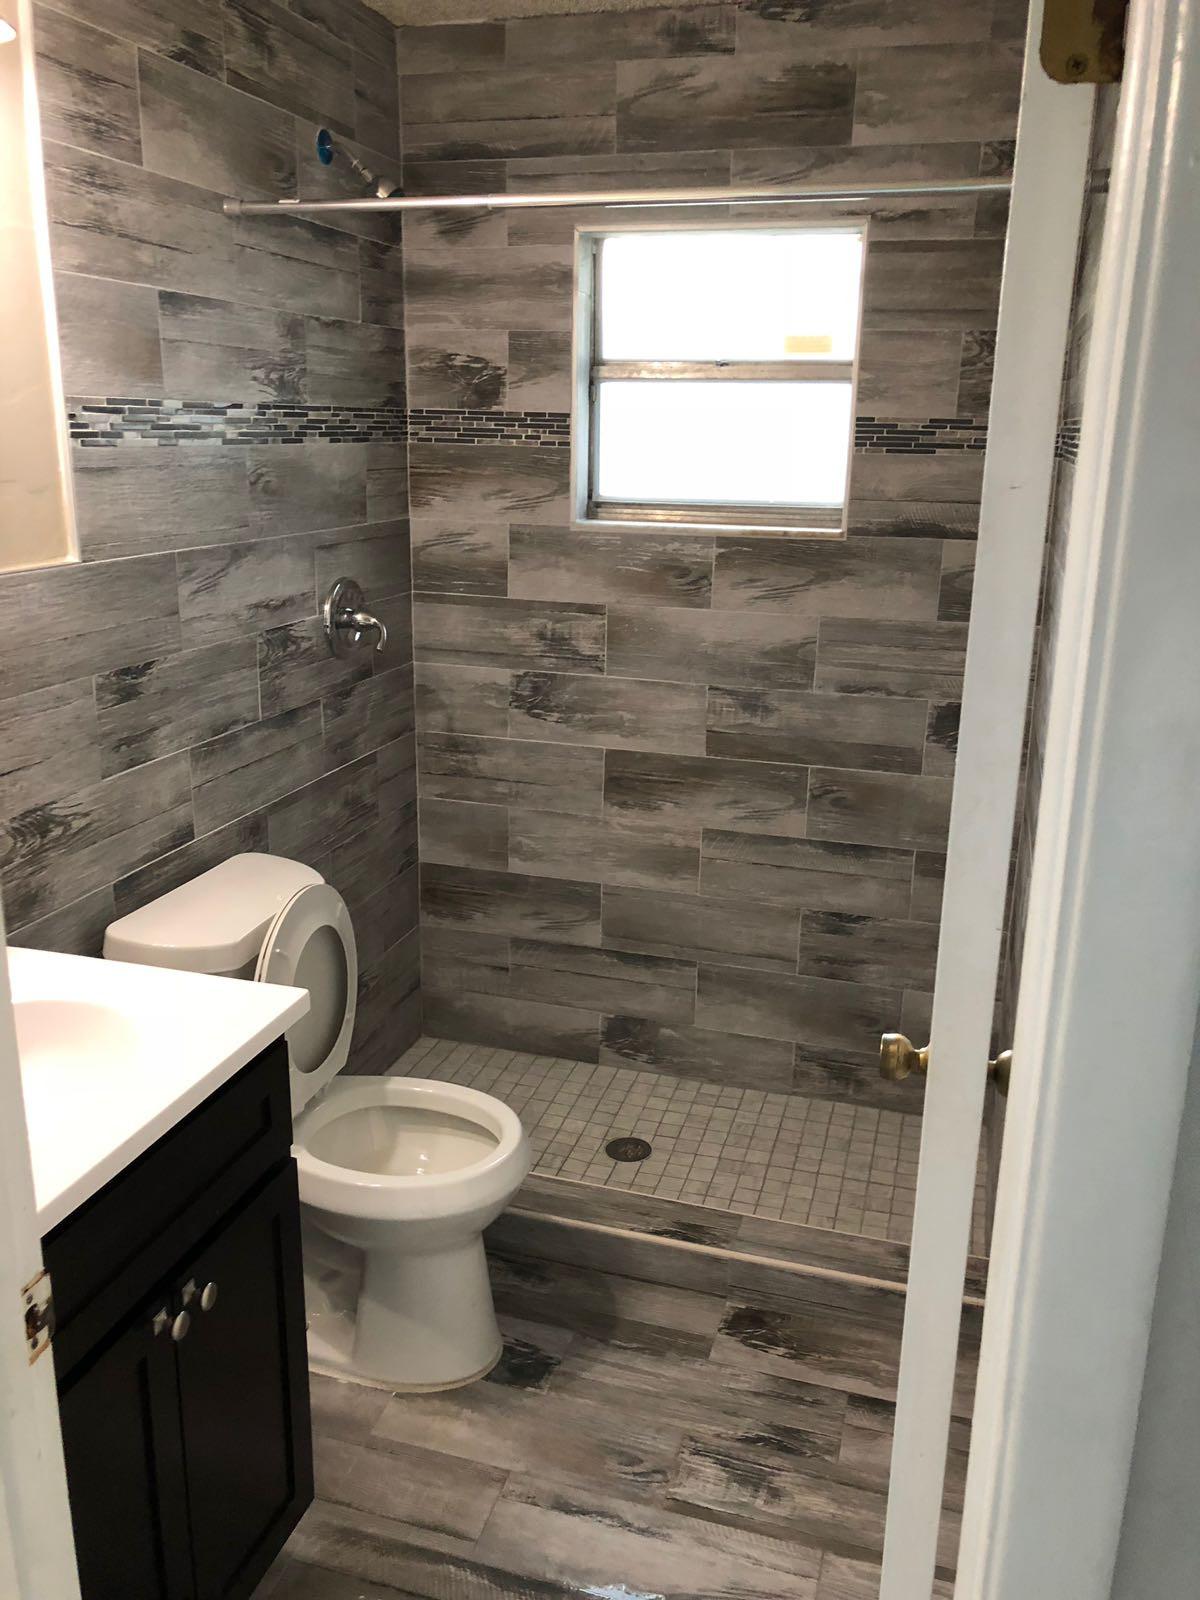 Bathroom Remodeling Miami Fl  Bathroom Remodeling Hialeah And Miami Dade County Florida